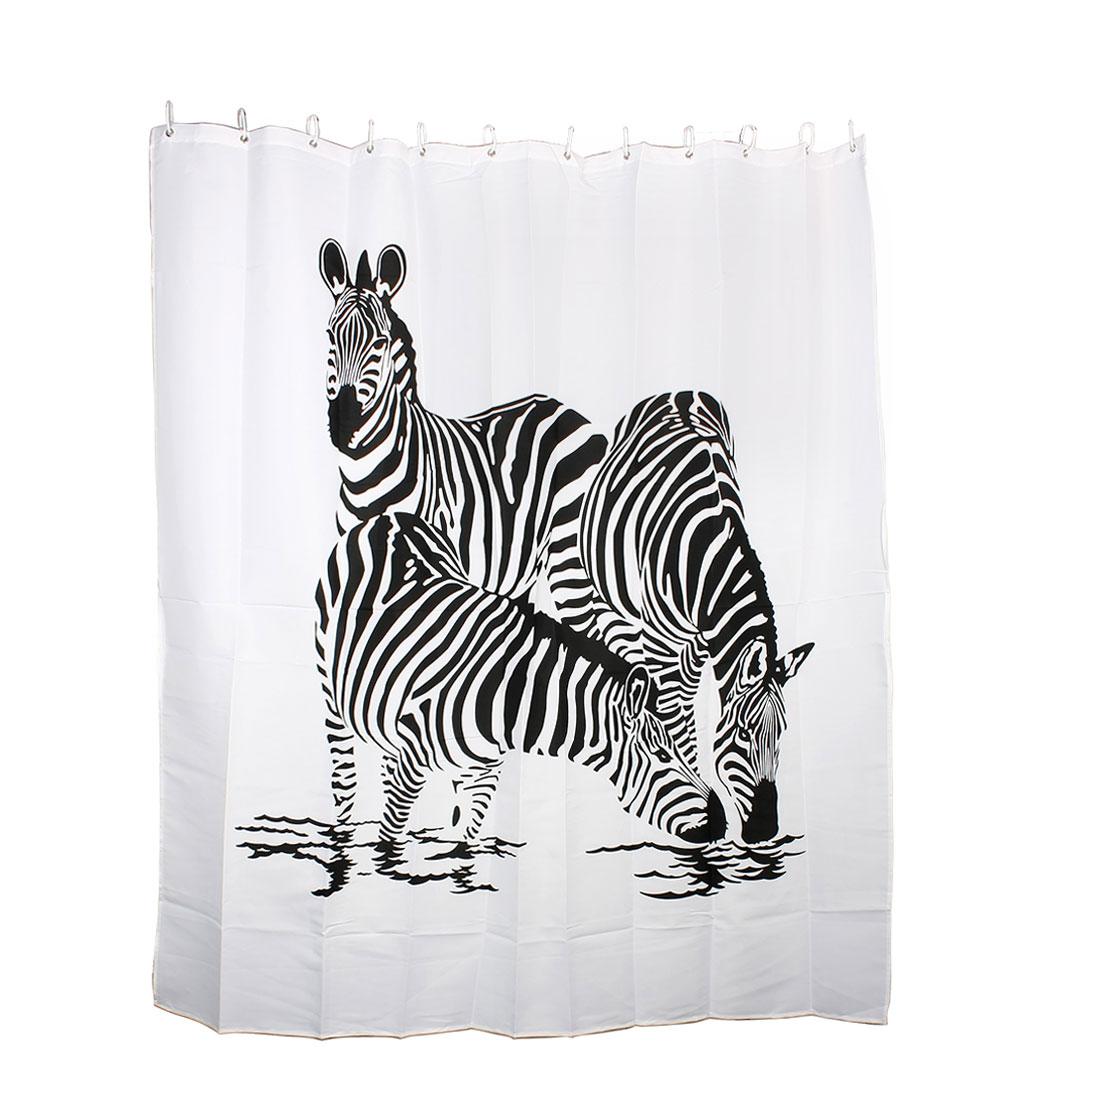 Zebra Drinking Print Bathroom Decor Shower Curtain w 12 Hooks Rings 180 x 180cm